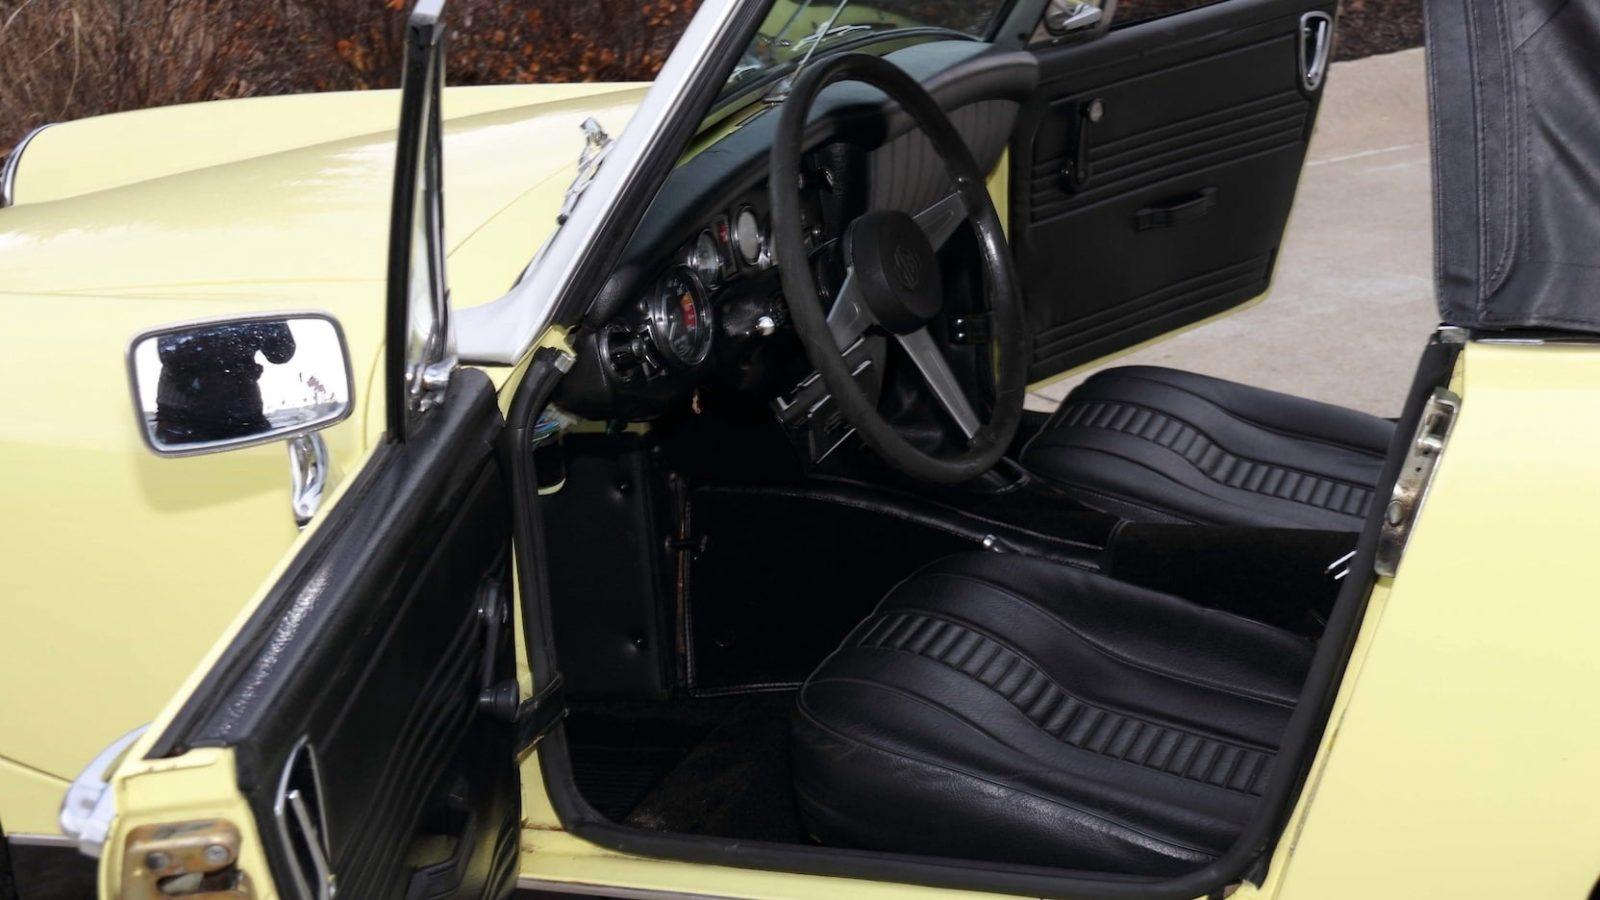 1976 MG MIDGET ROADSTER